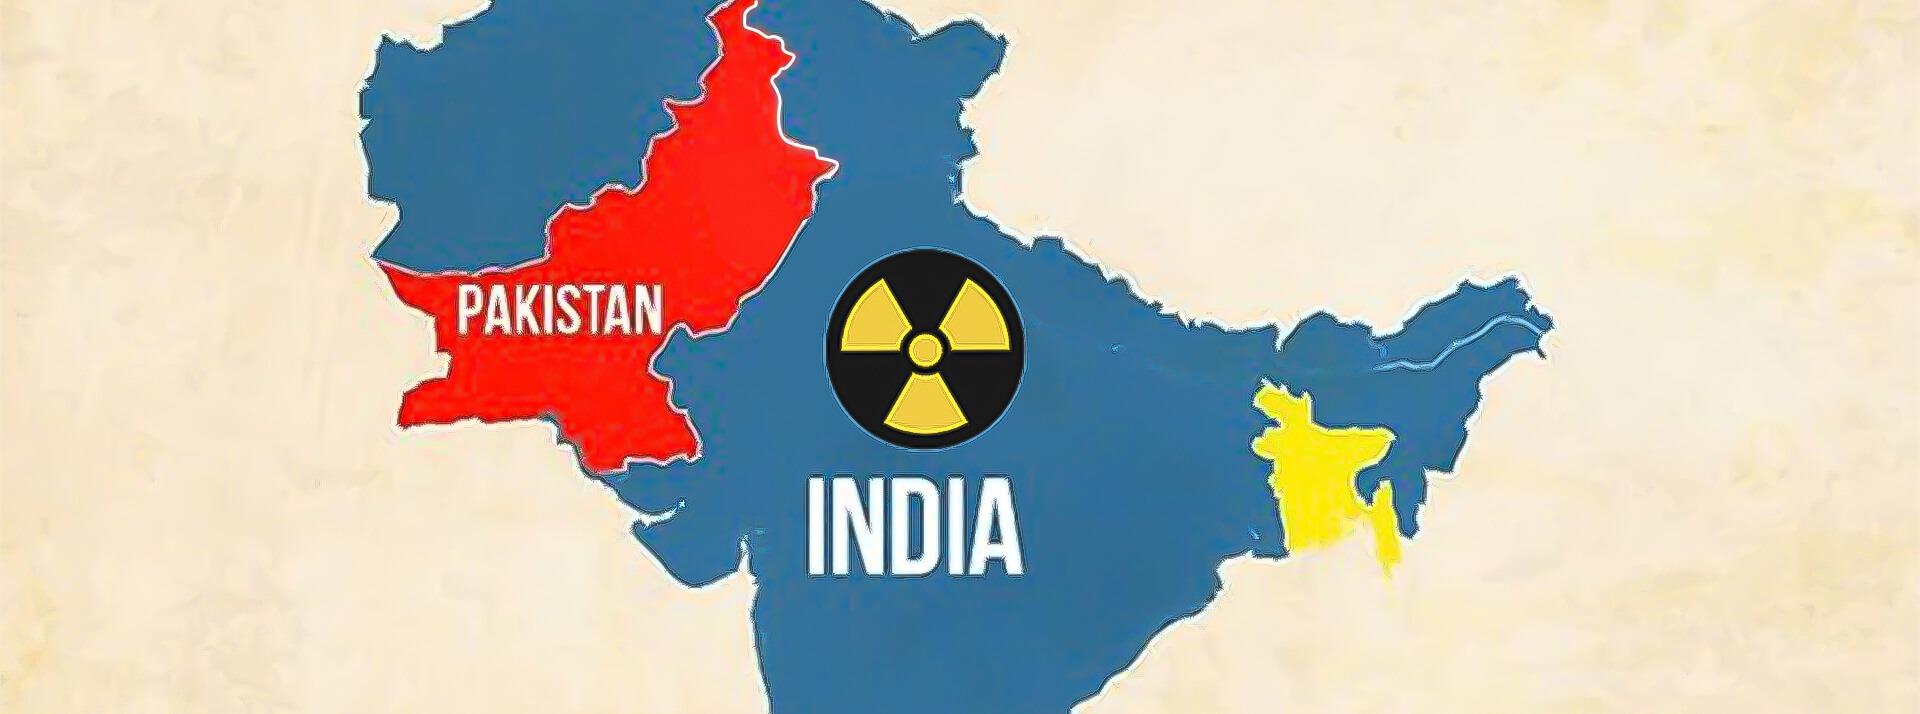 India-Pakistan-China Nuclear Dynamics